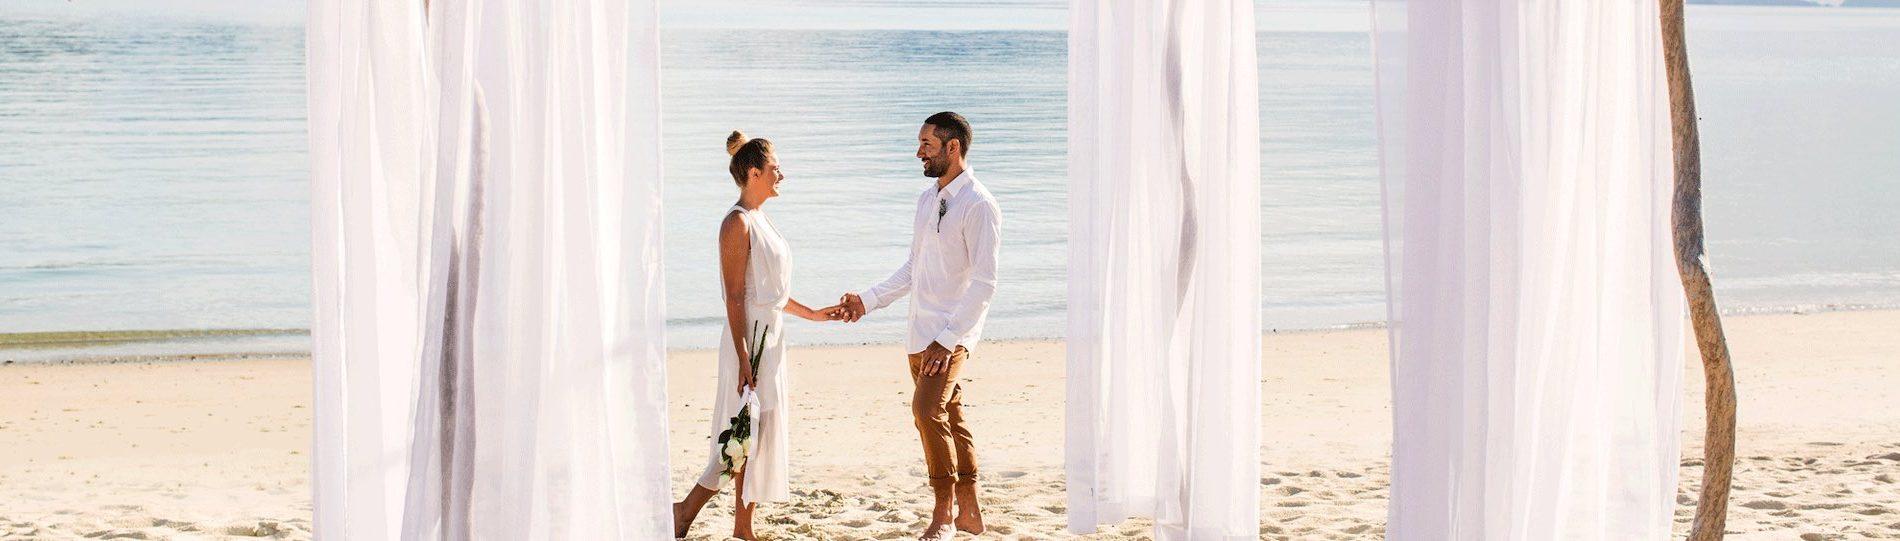 wedding planning companies cairns